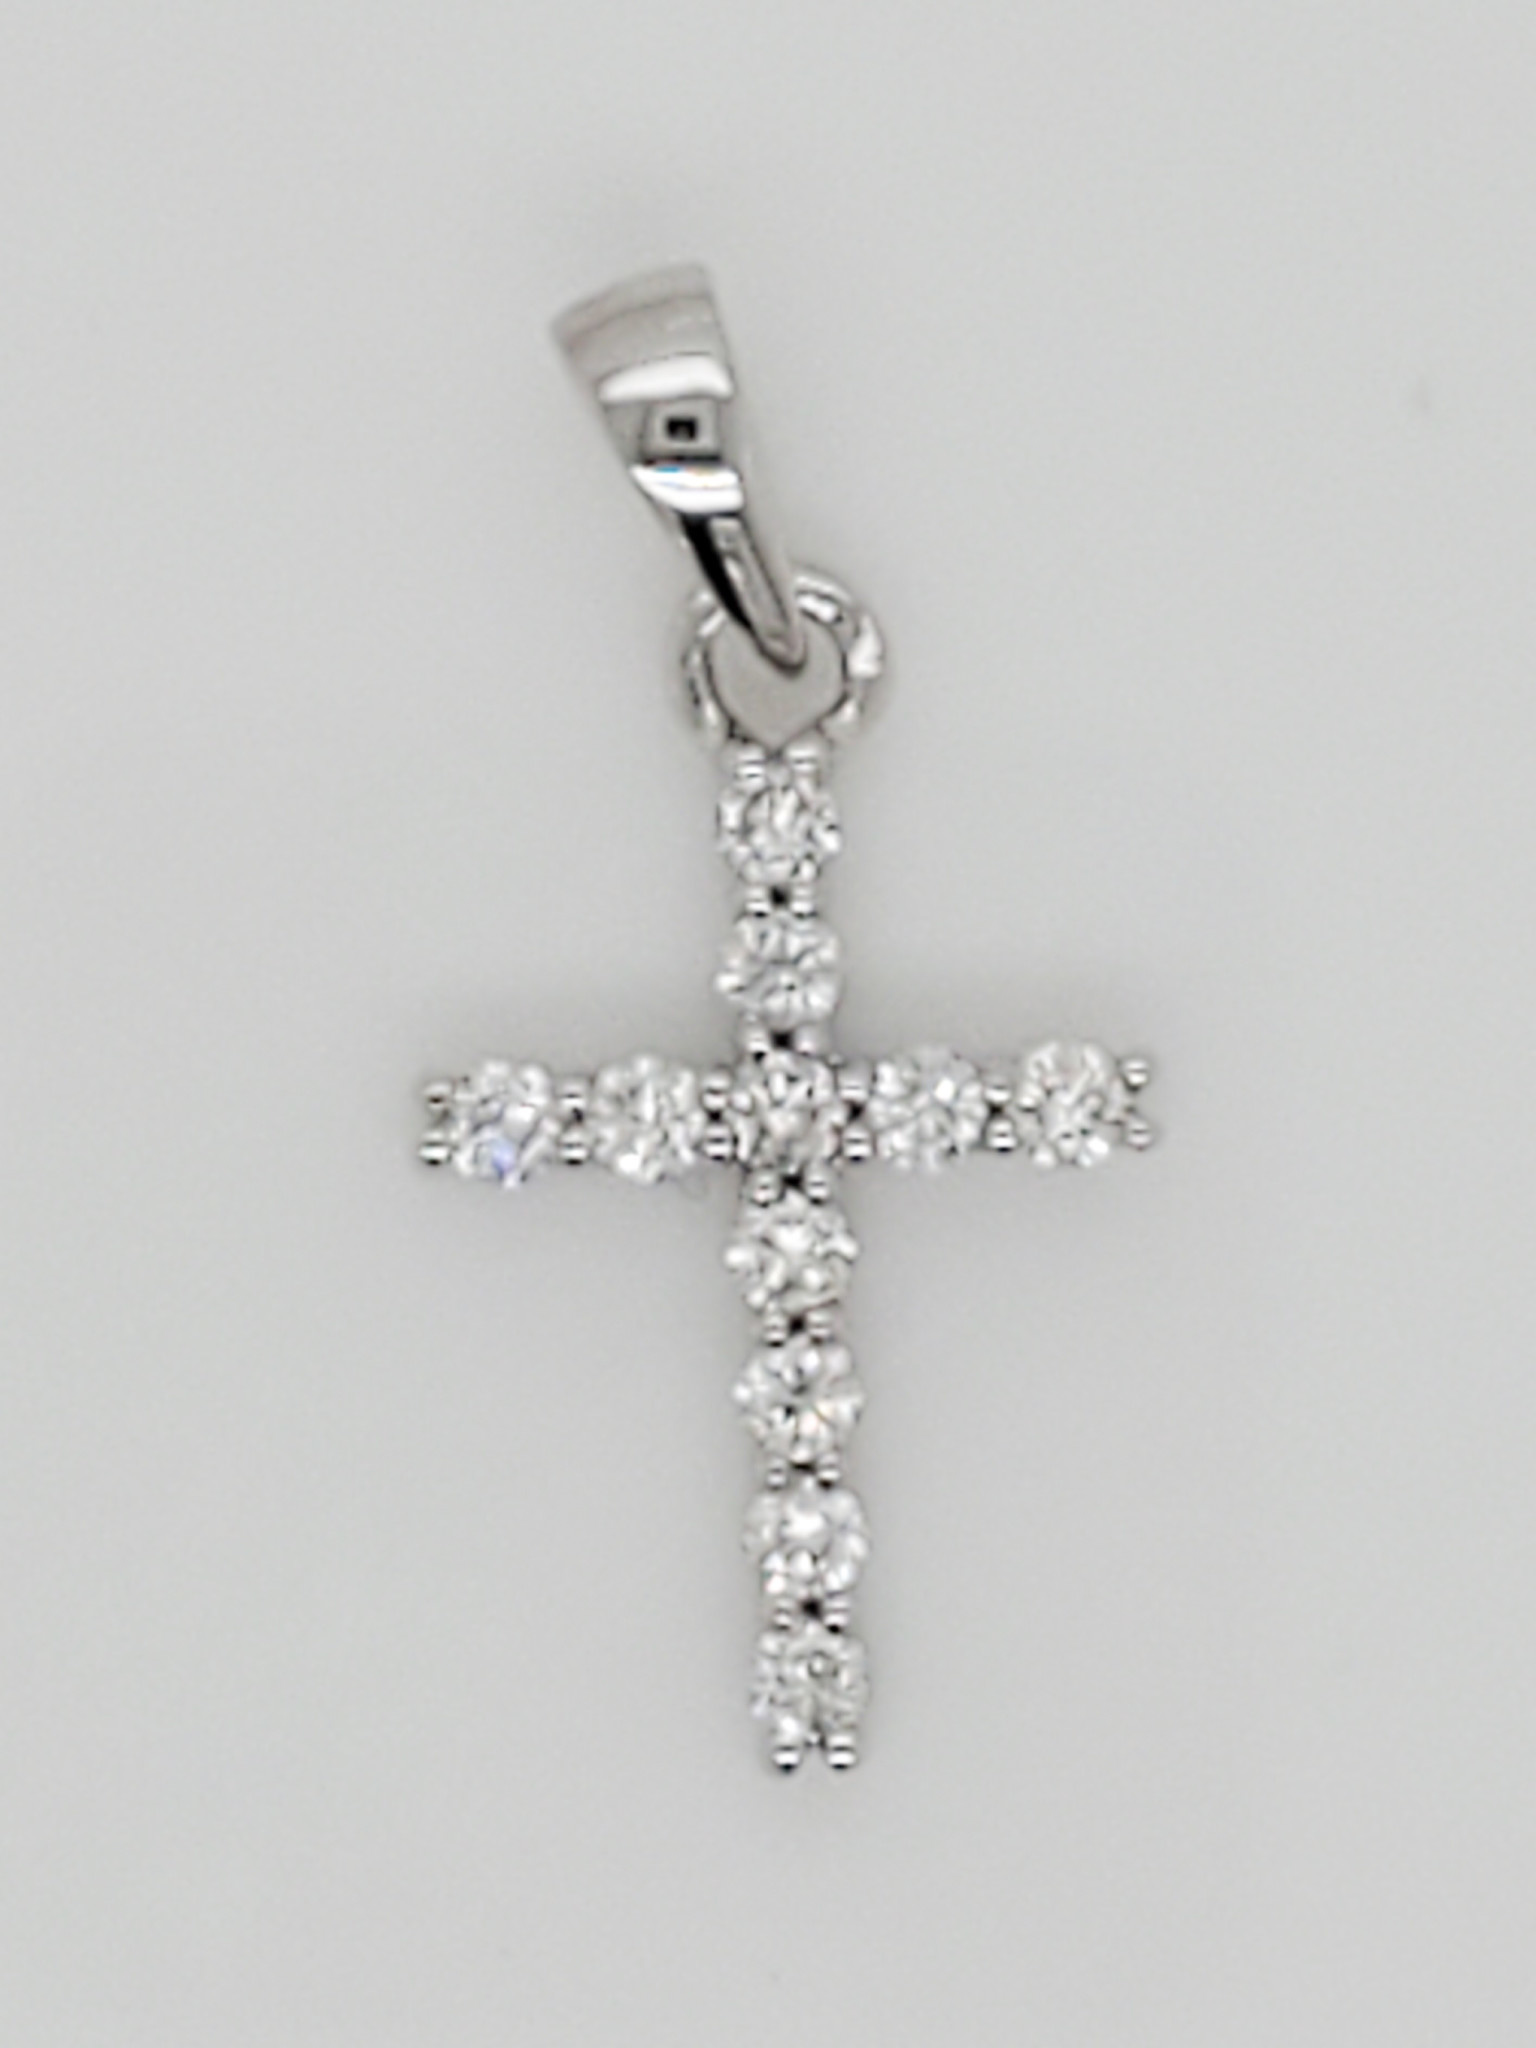 14KT WG Diamond Cross Pendant 0.15 CTTW